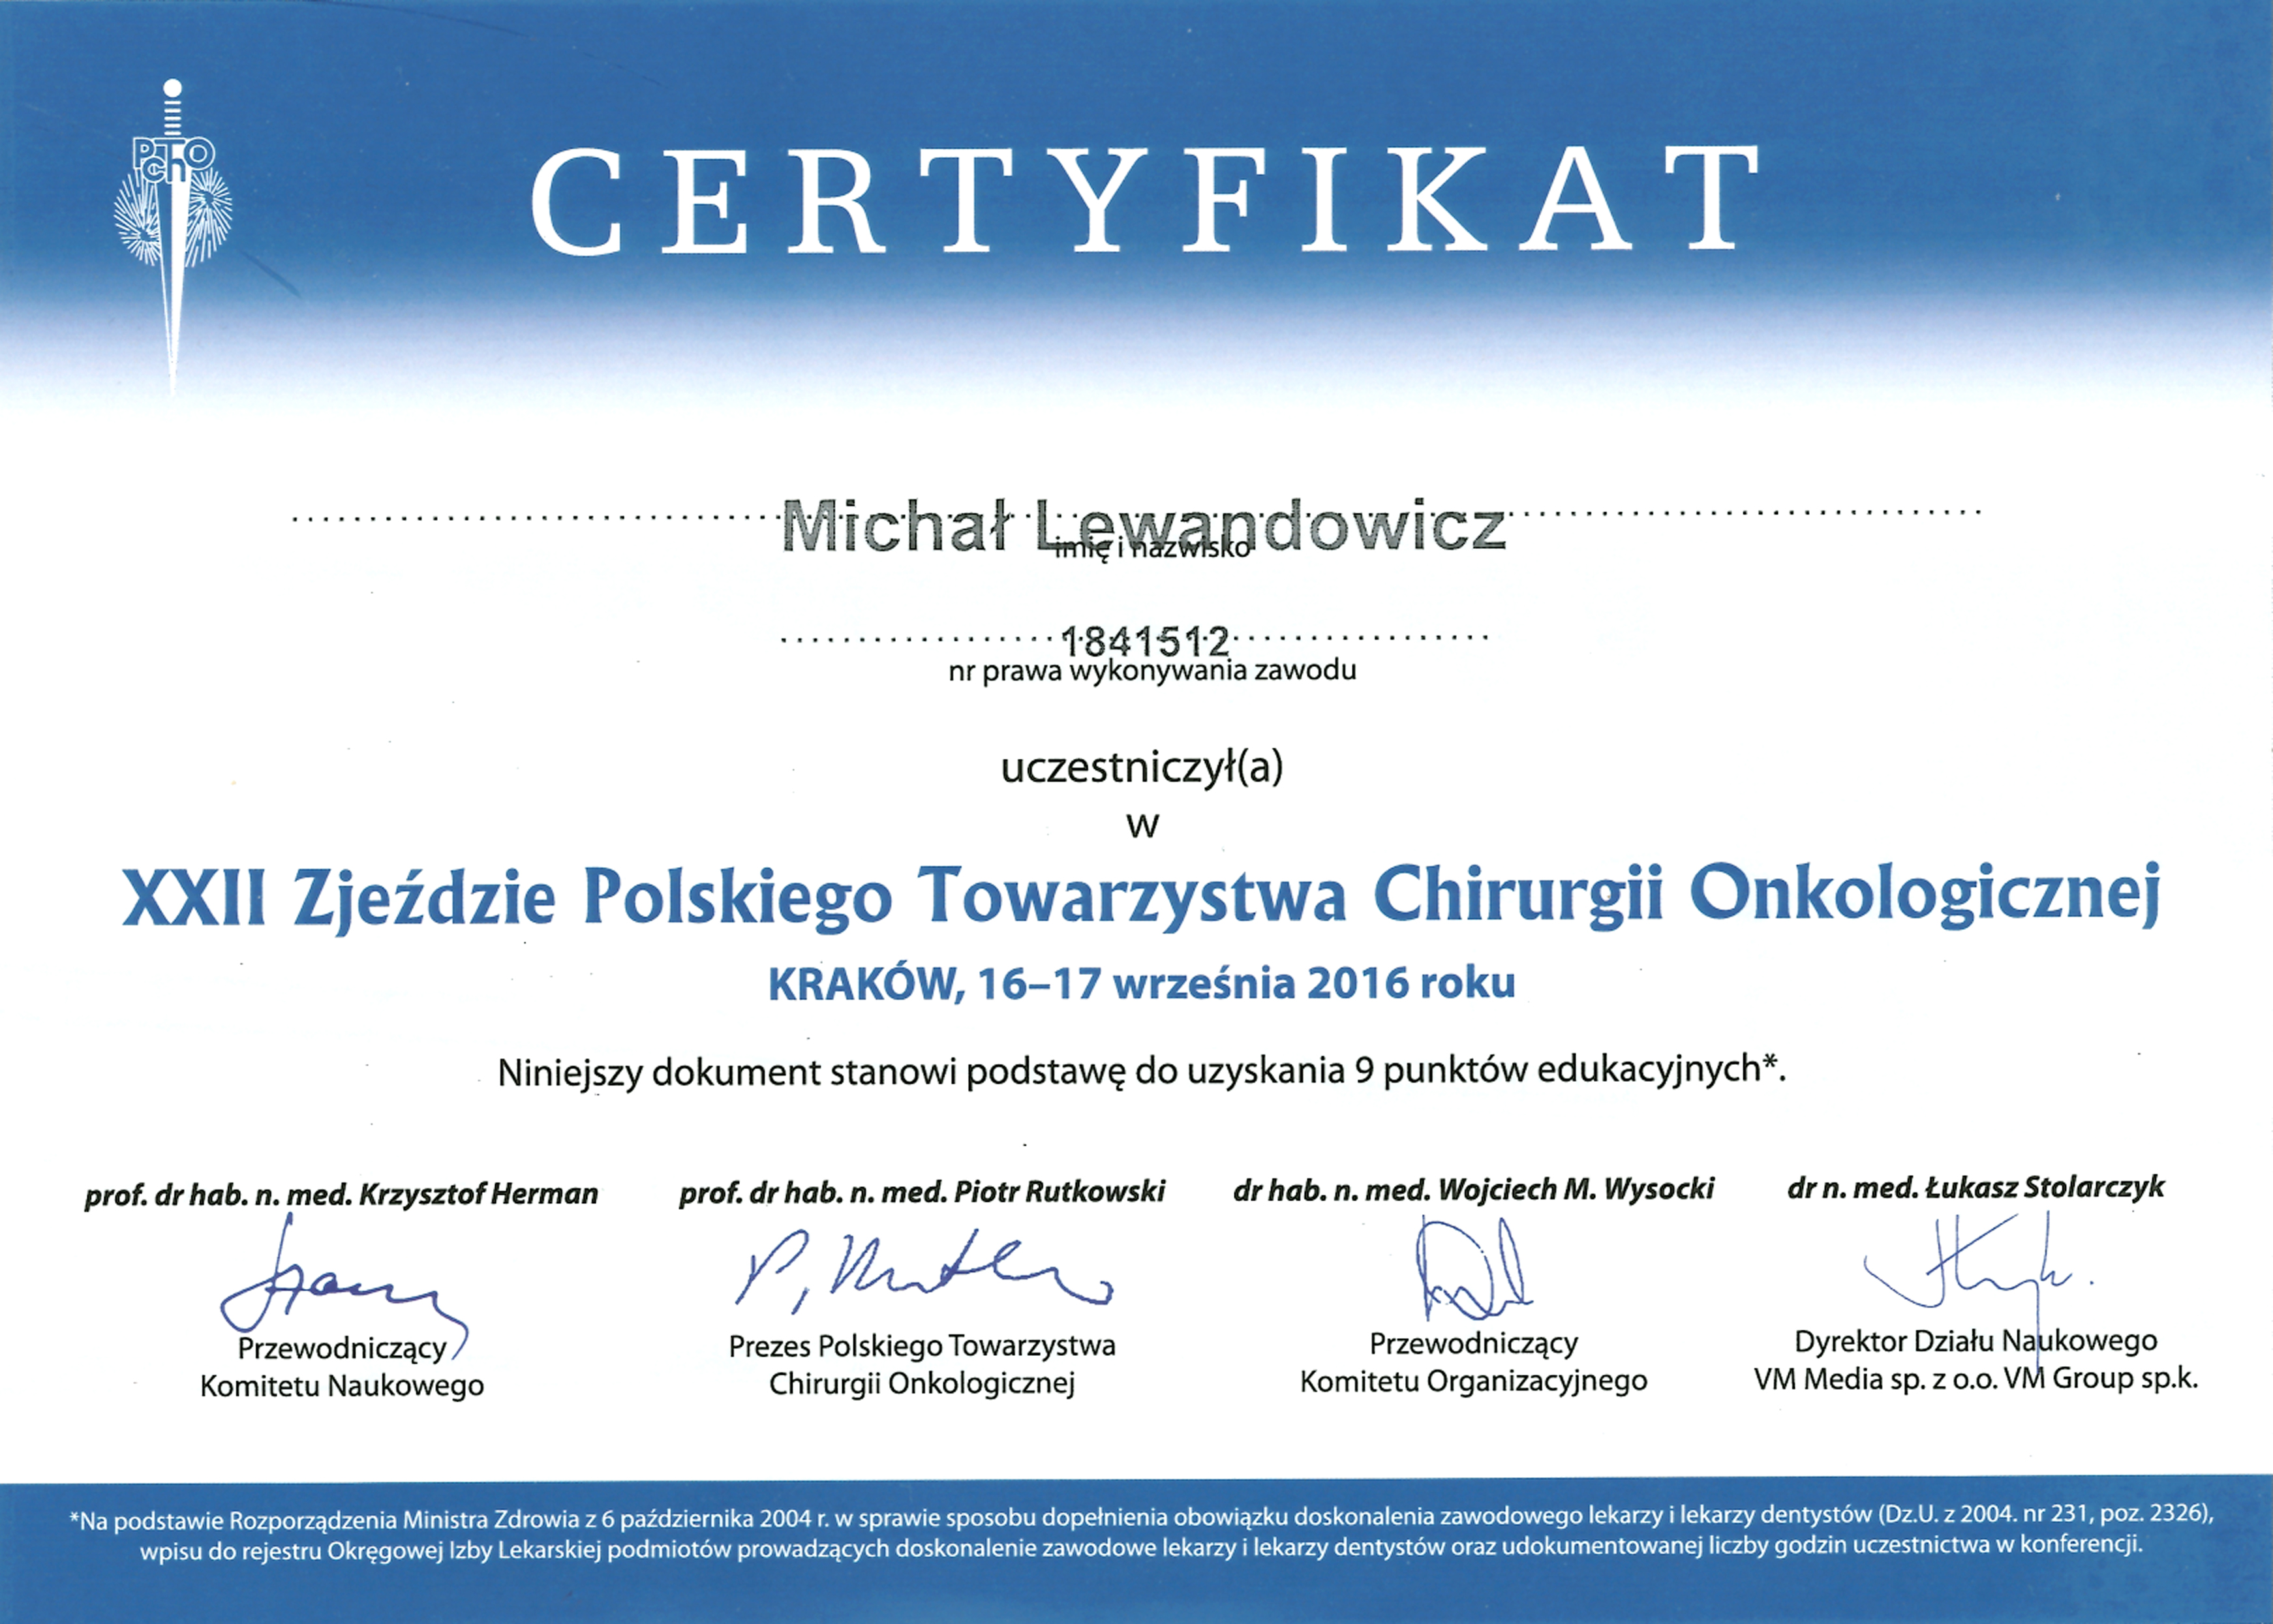 Cert PTChO 2016 - dr n. med. Michał Lewandowicz